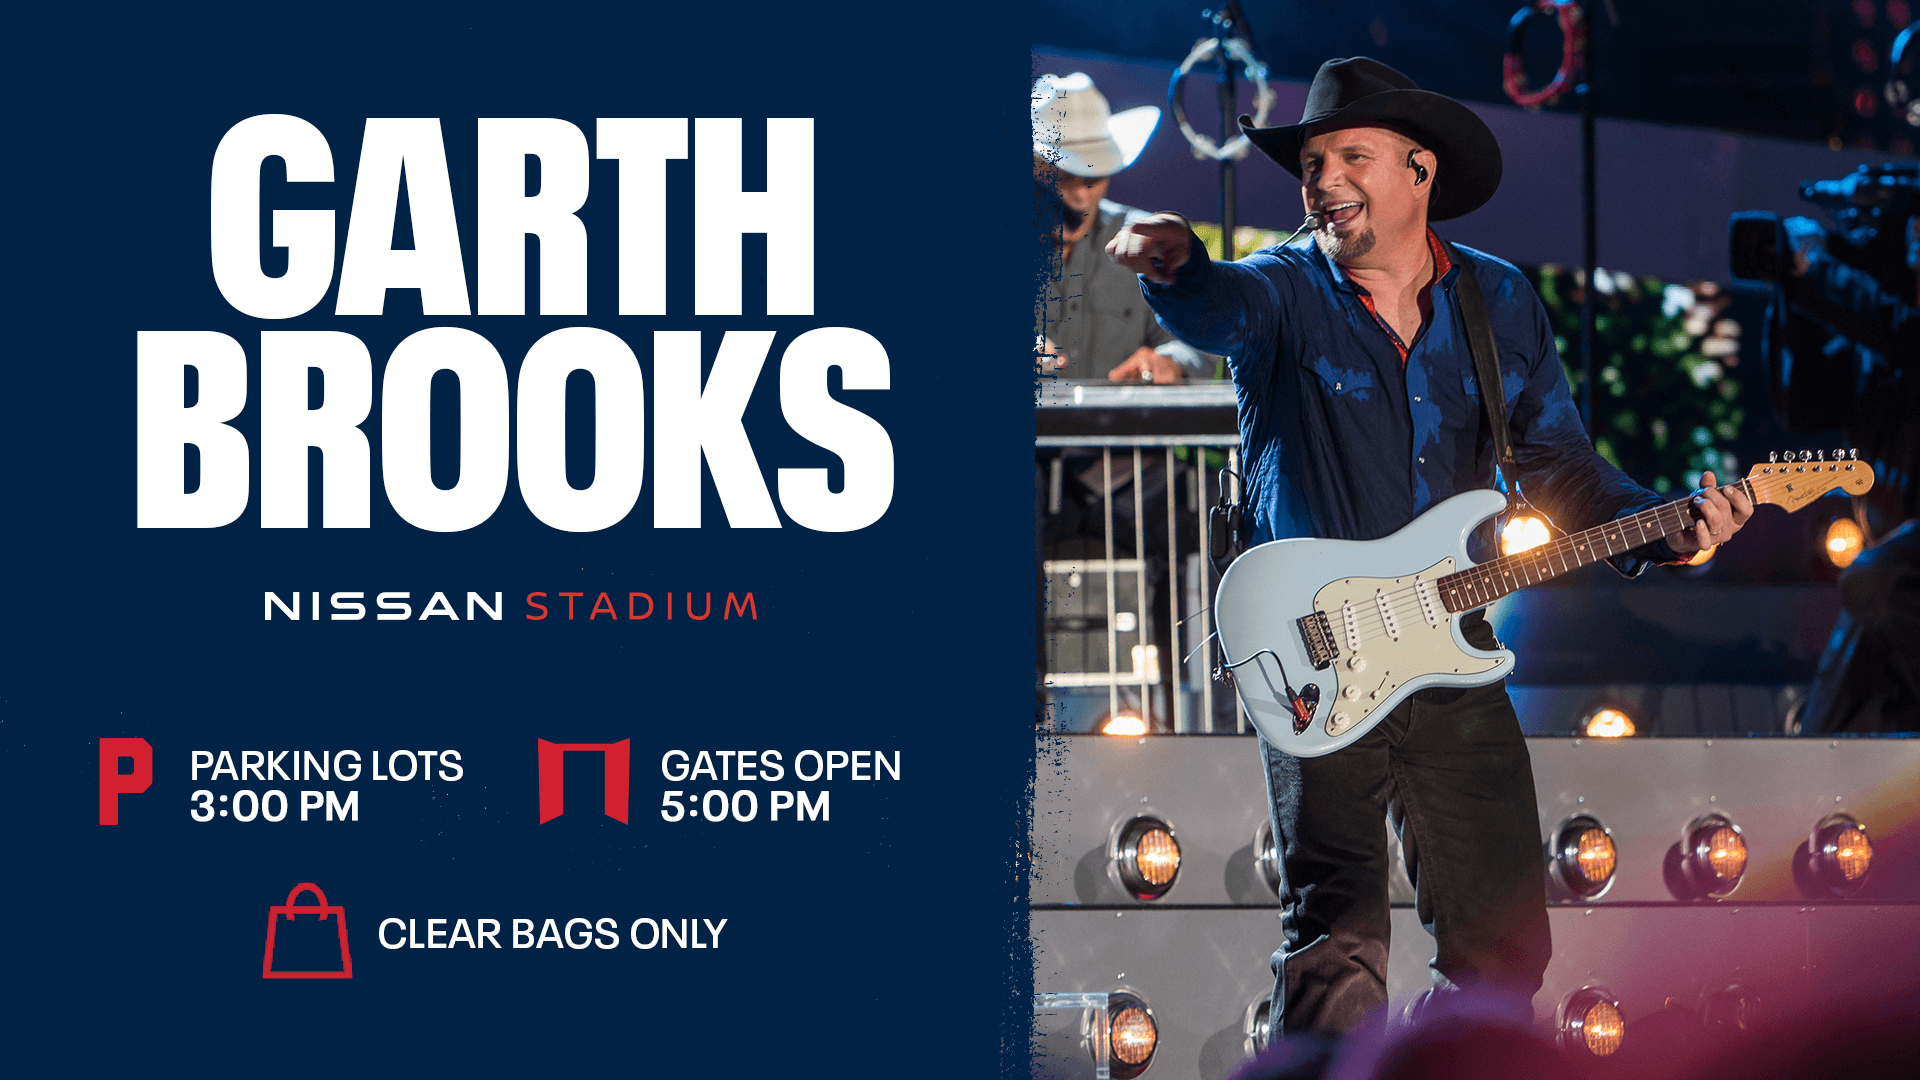 Garth Brooks - Nissan Stadium